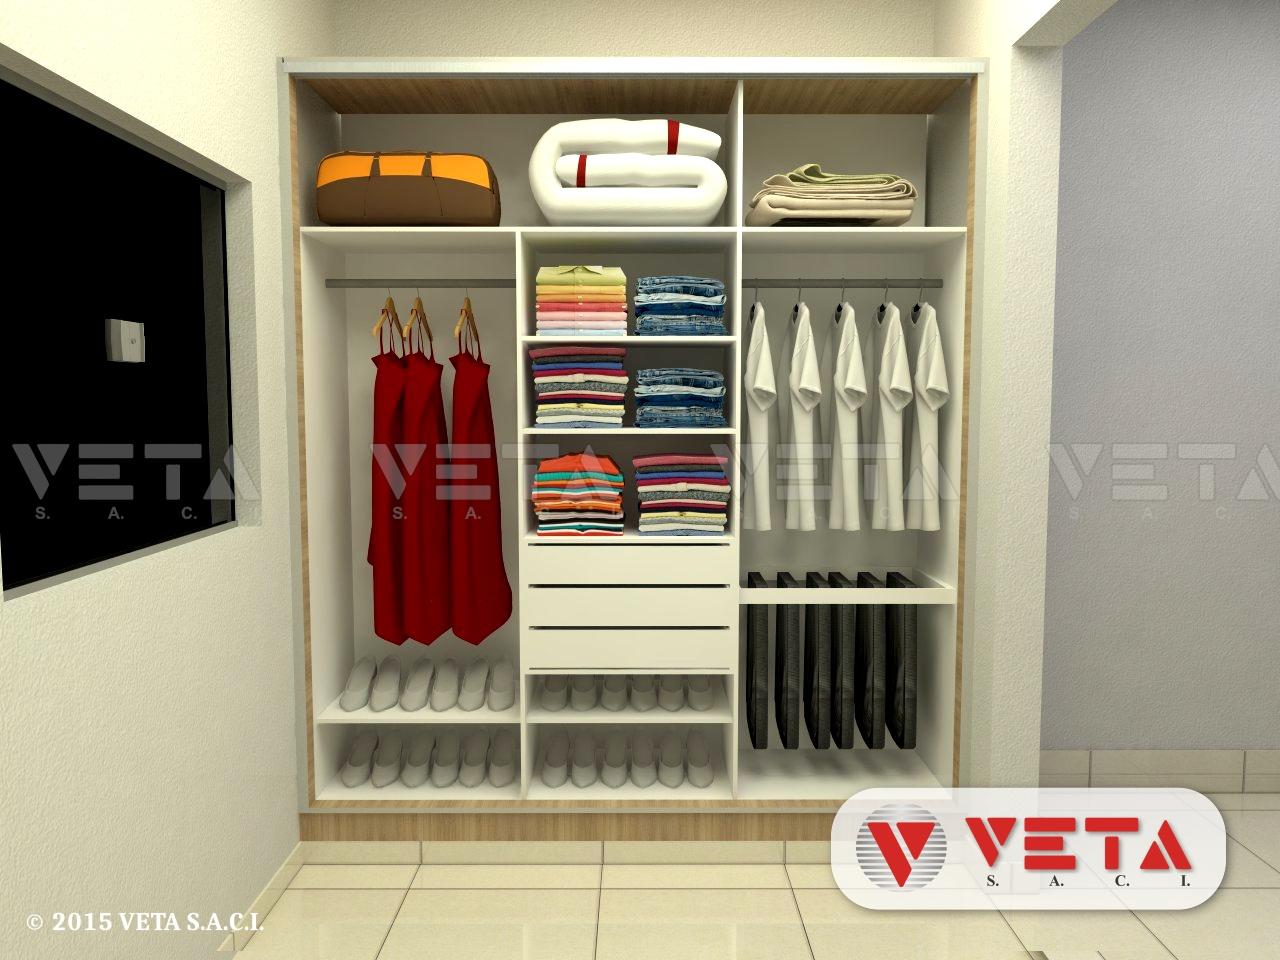 Vestidores para dormitorios veta s a c i - Vestidores para dormitorios ...